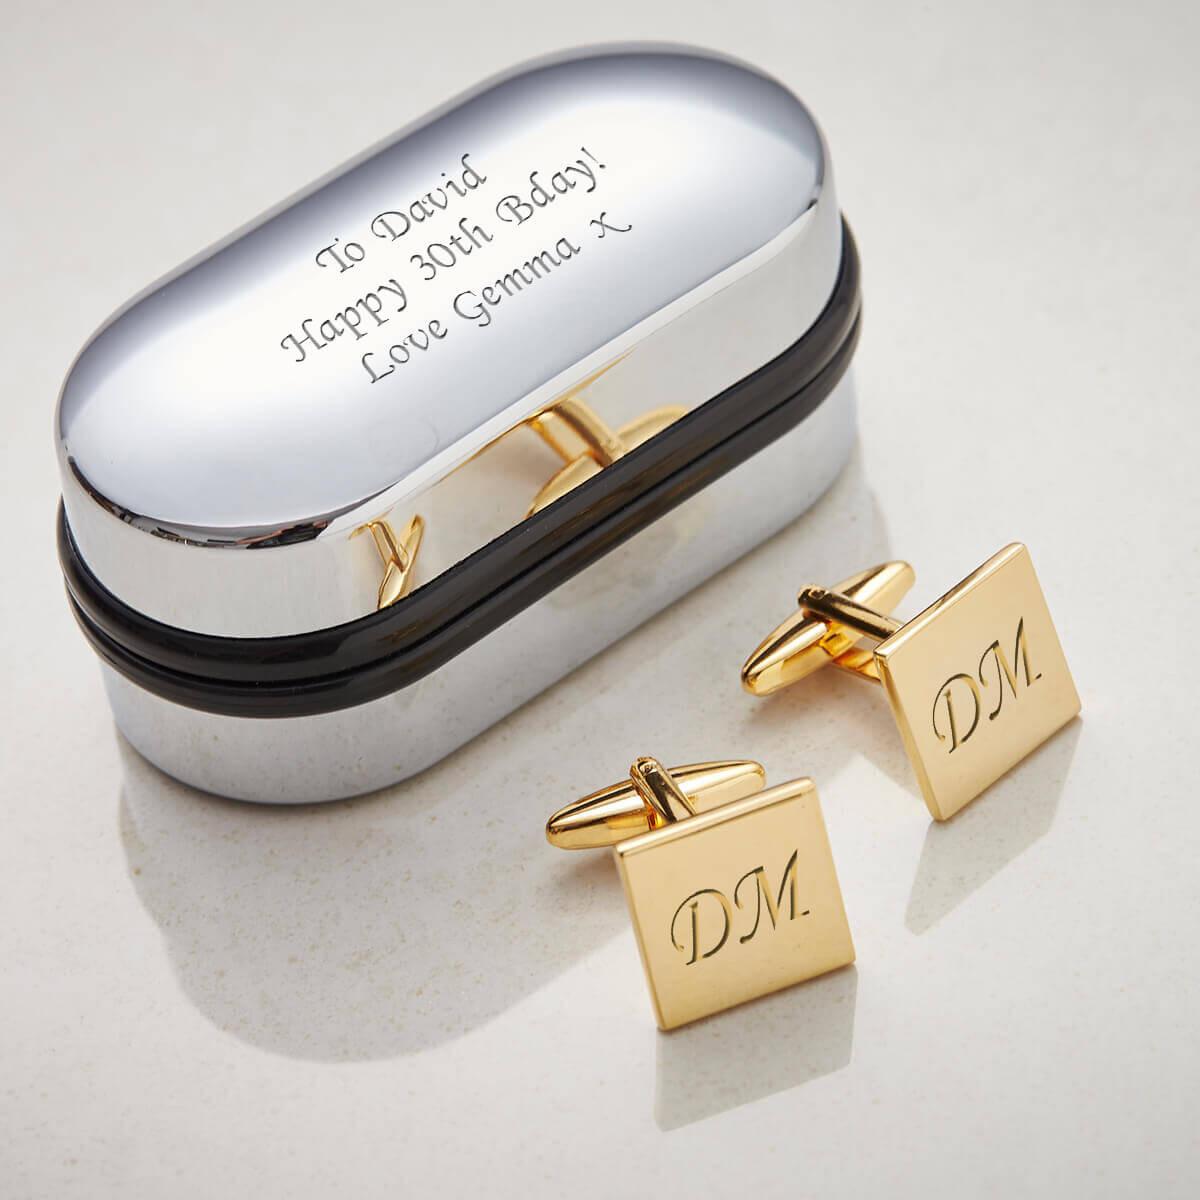 Personalised Gold Finish Square Cufflinks